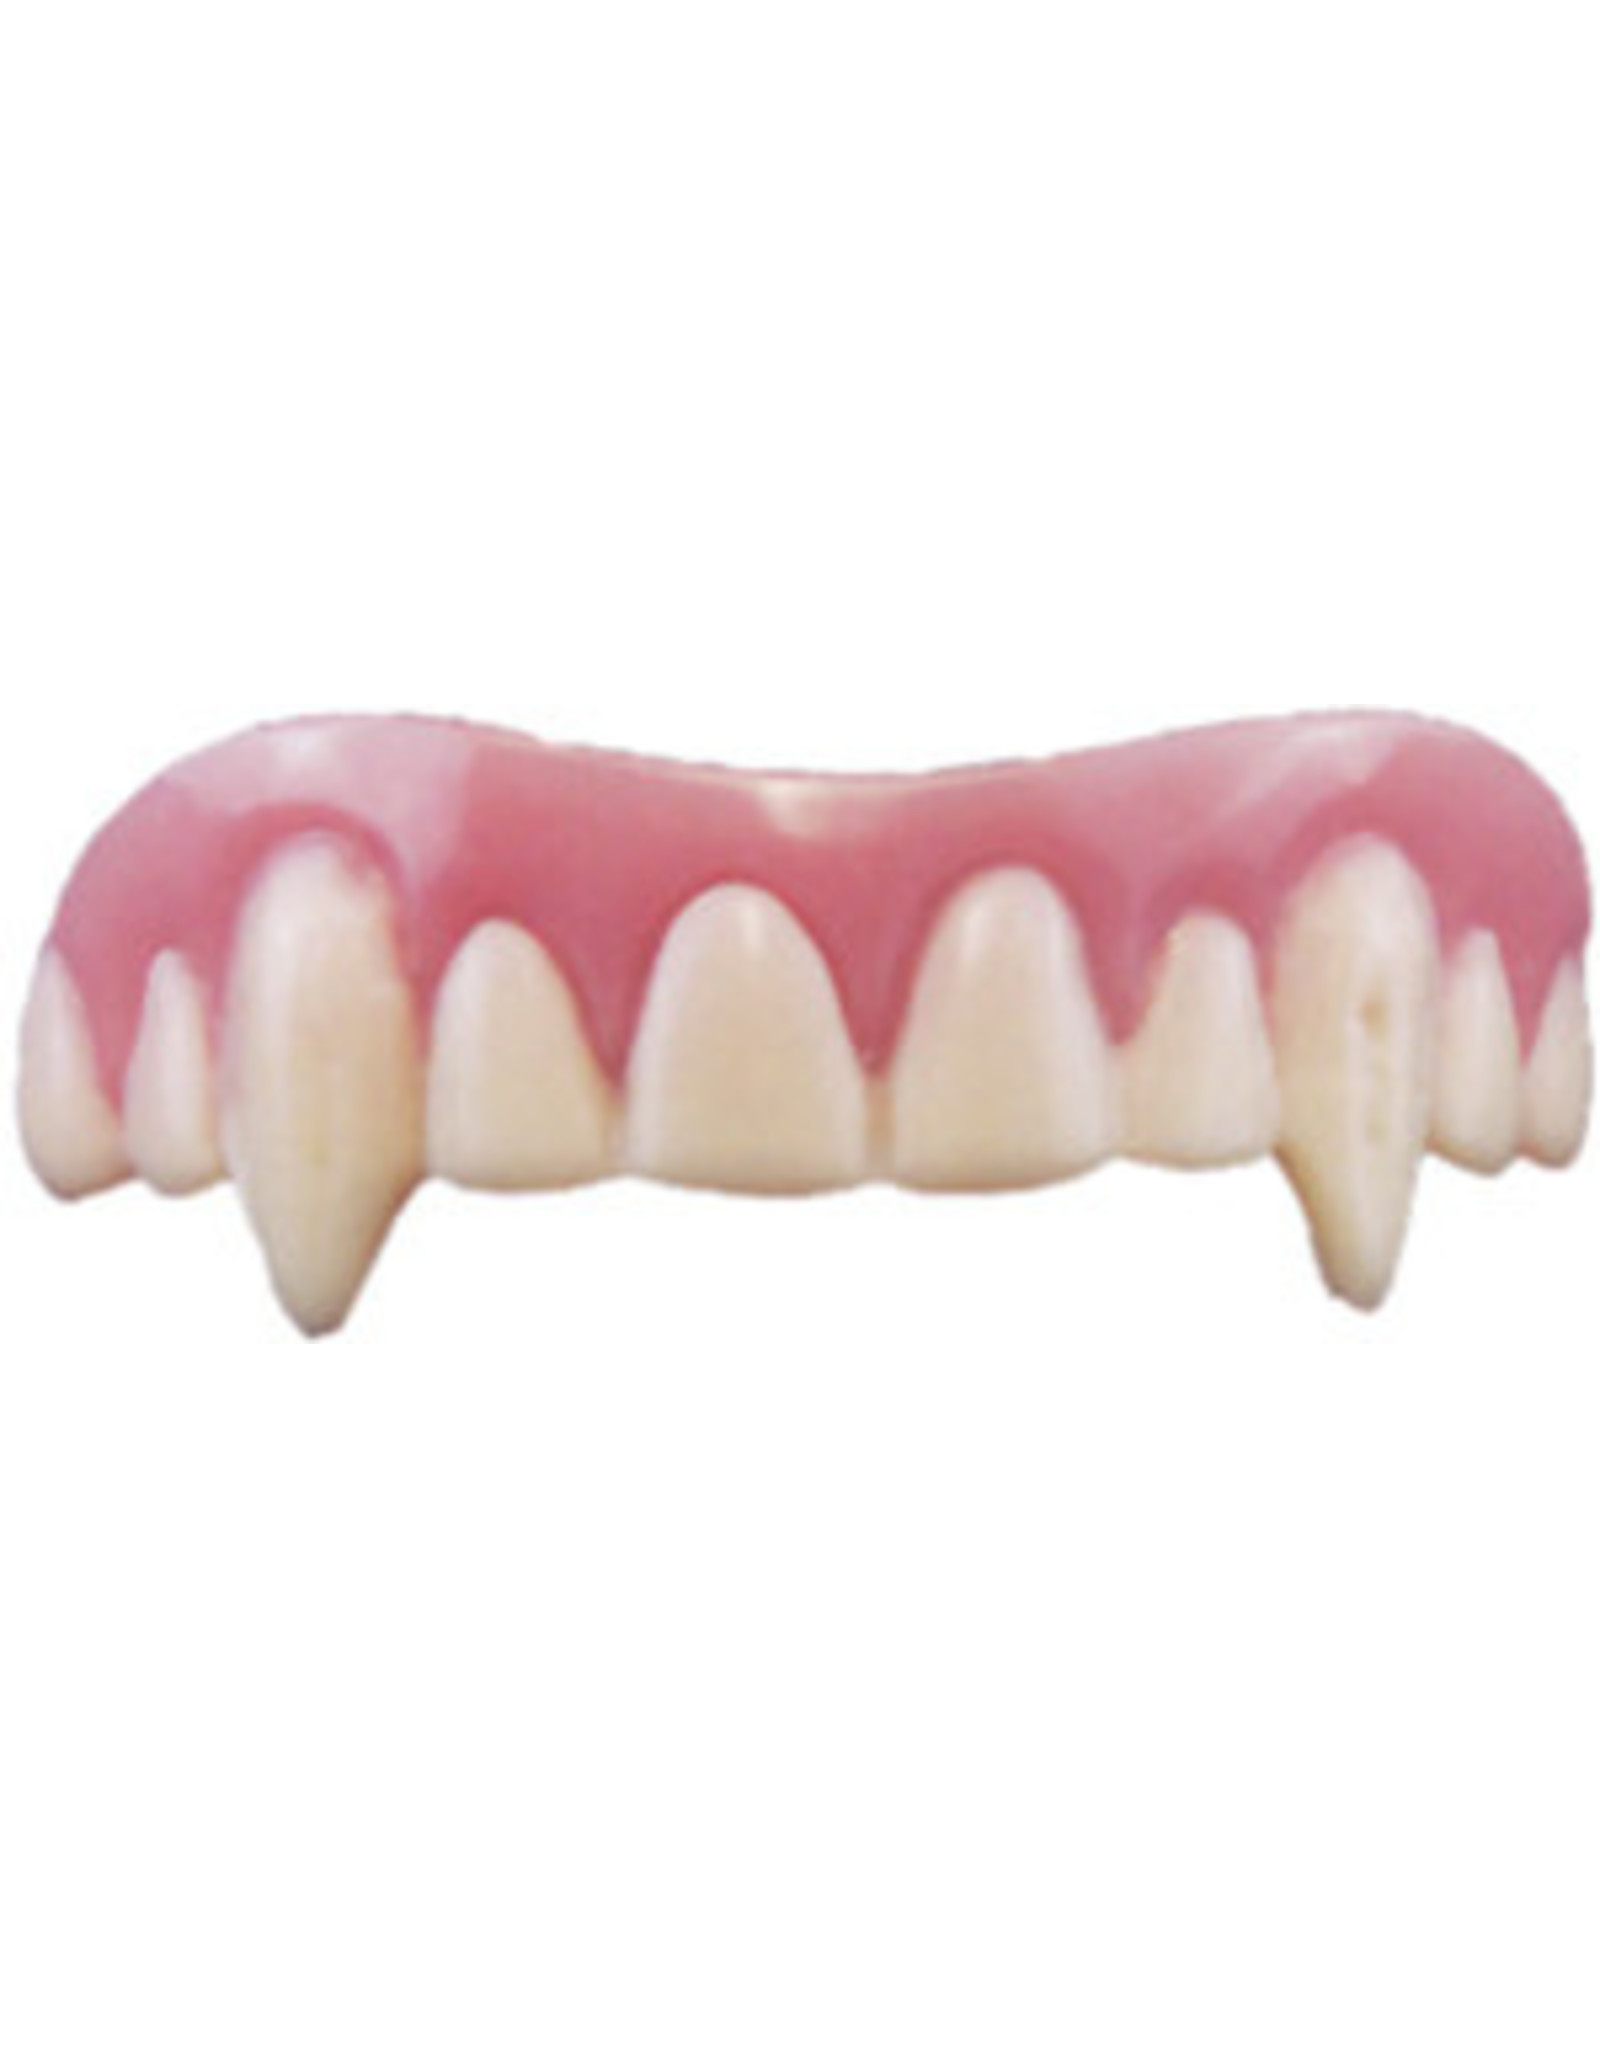 Billy-Bob Products Billy-Bob Teeth Vampire